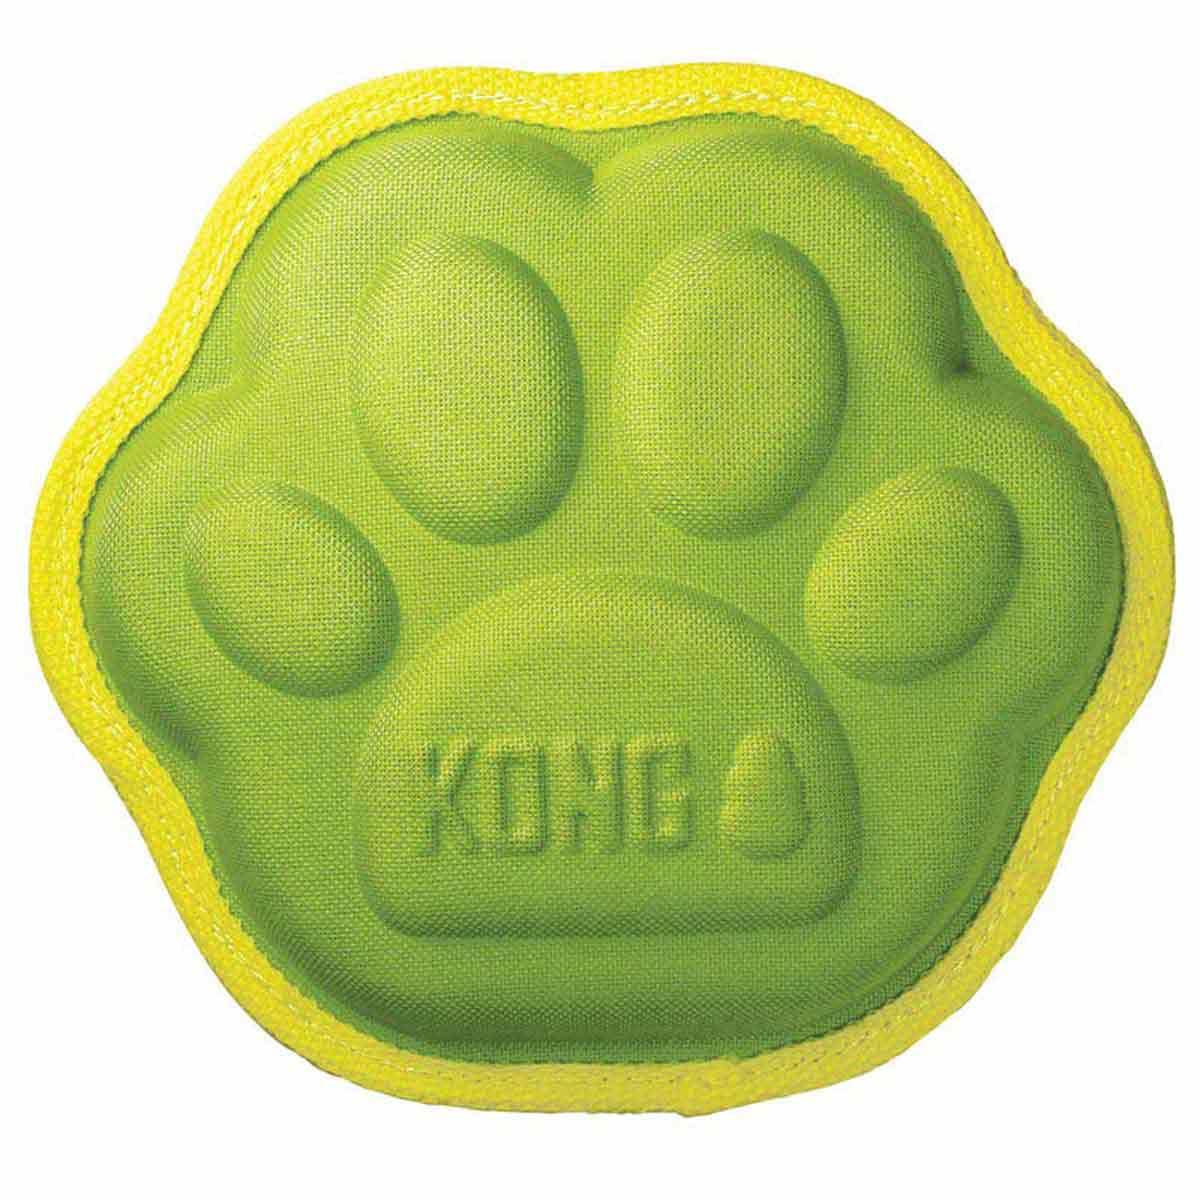 KONG Ballistic Imprints Paw Dog Toy